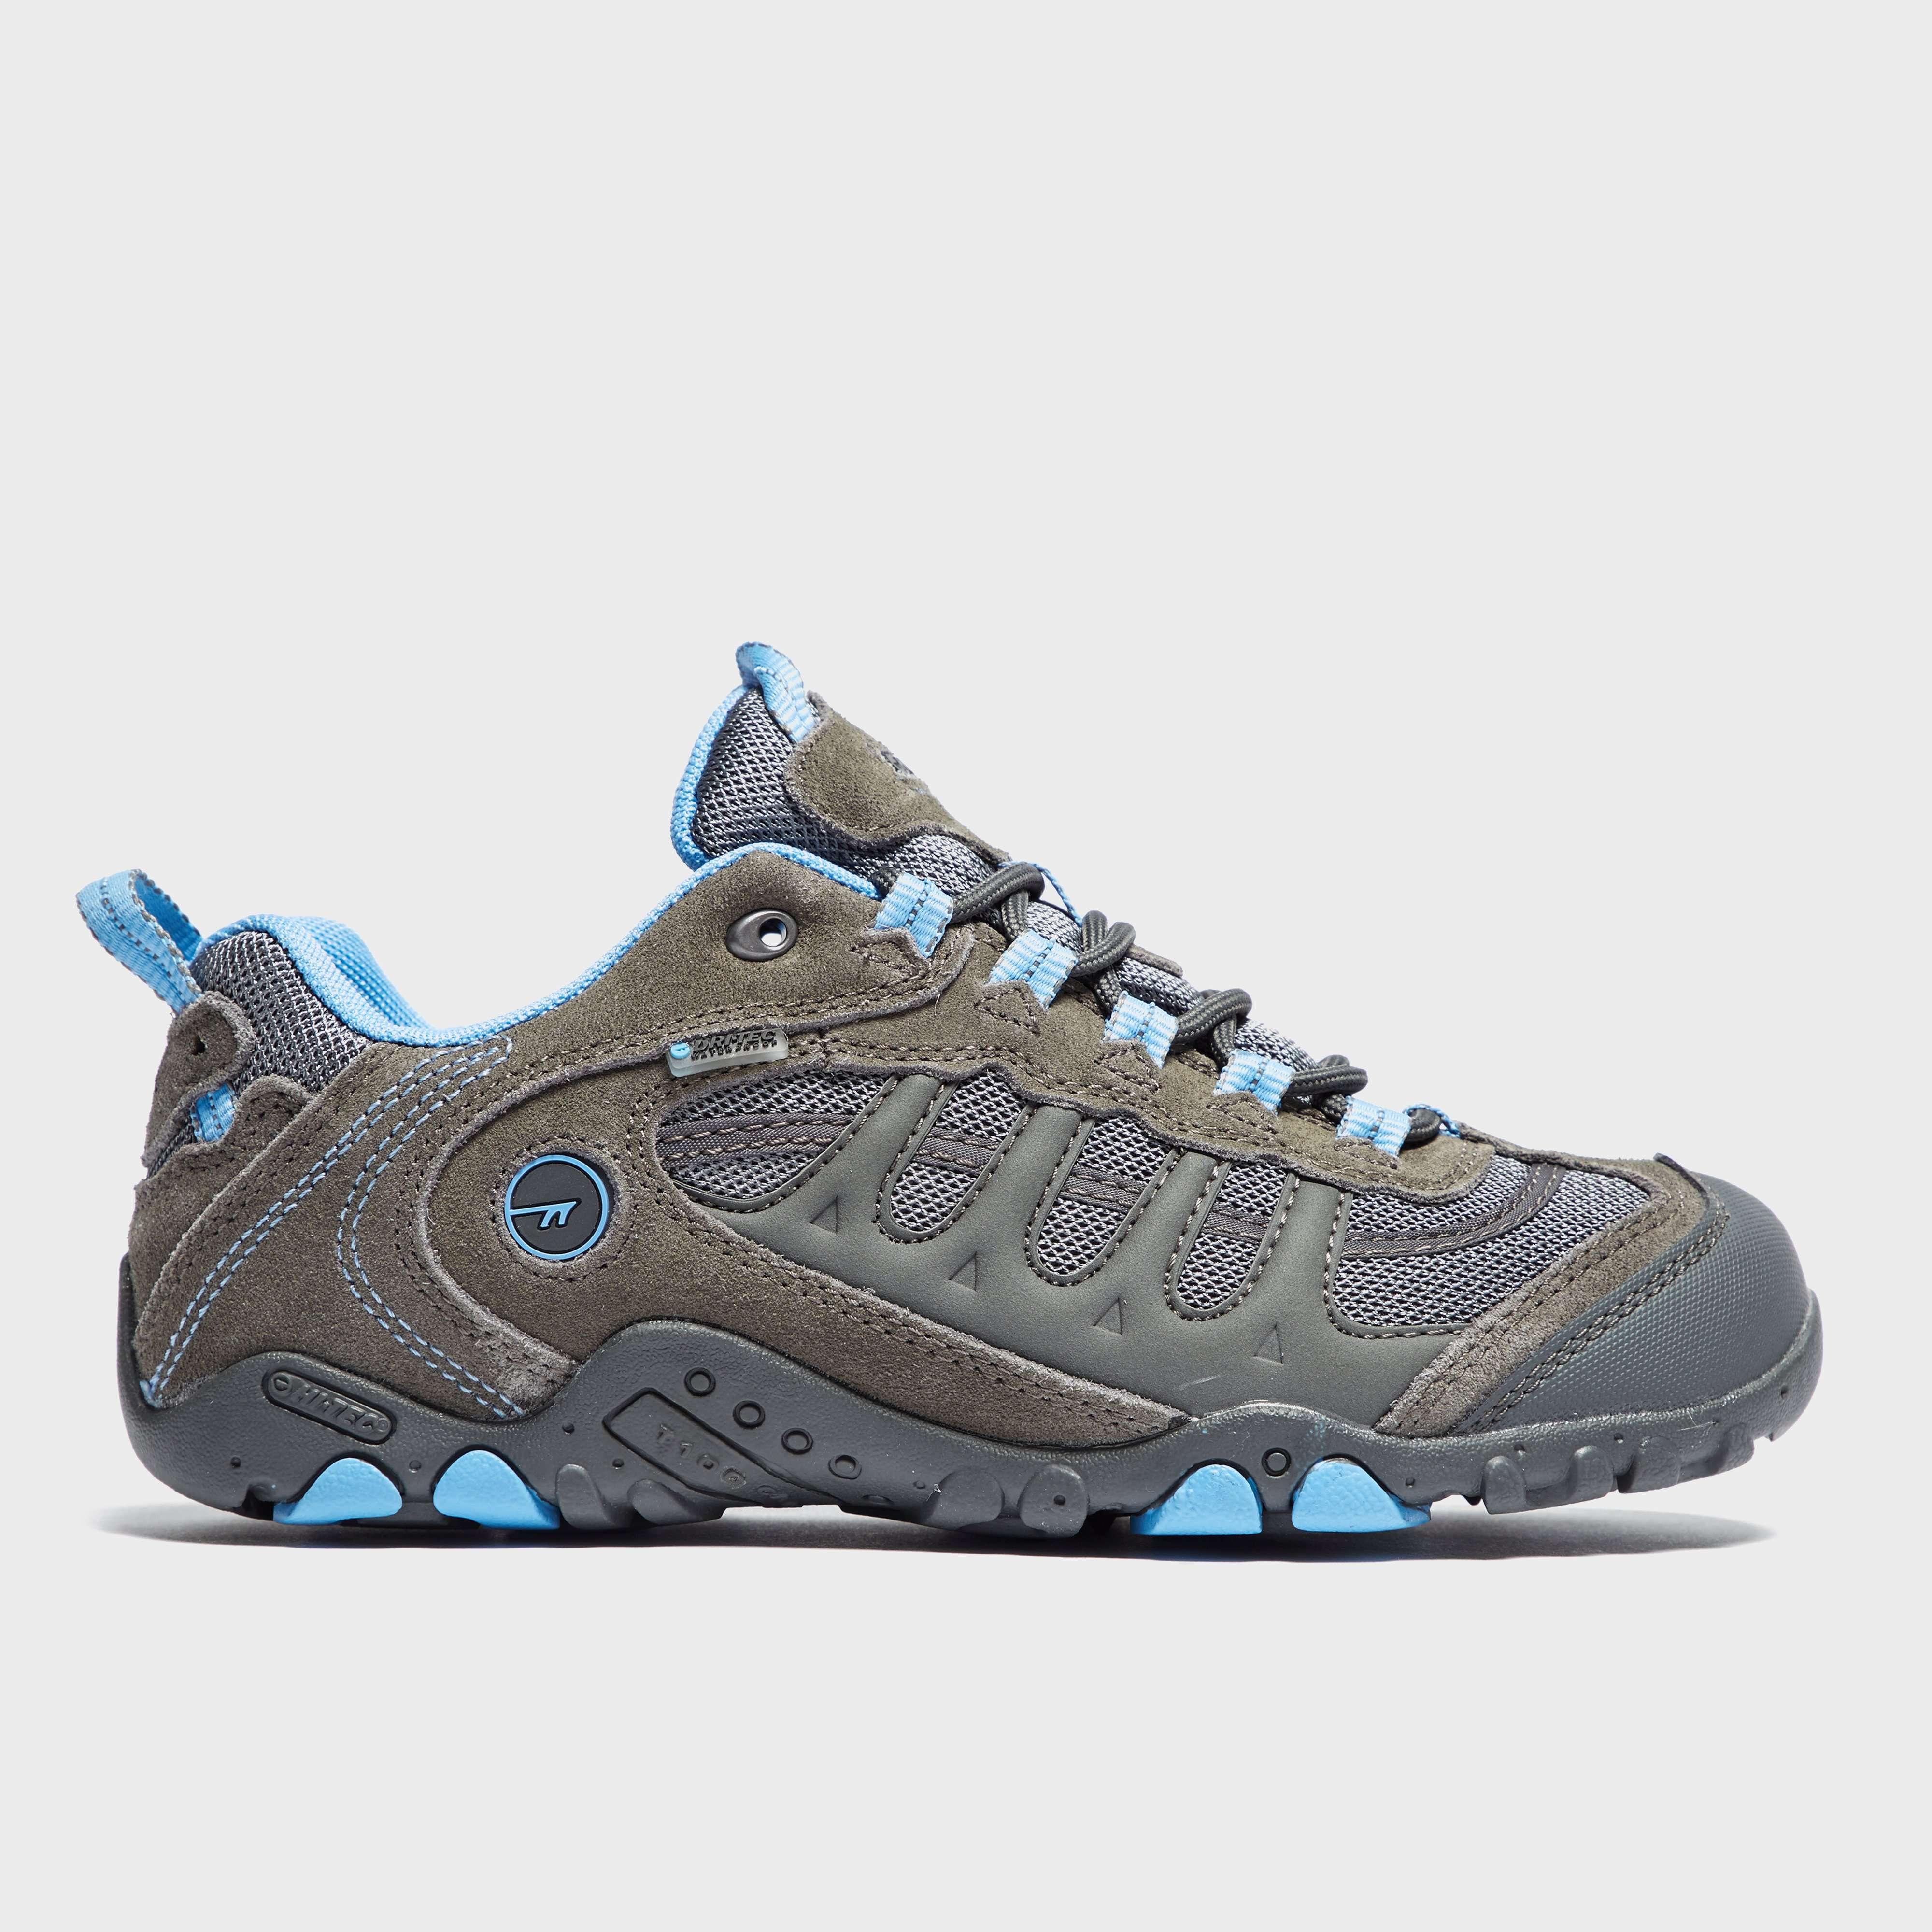 HI TEC Women's Penrith Low Walking Shoes